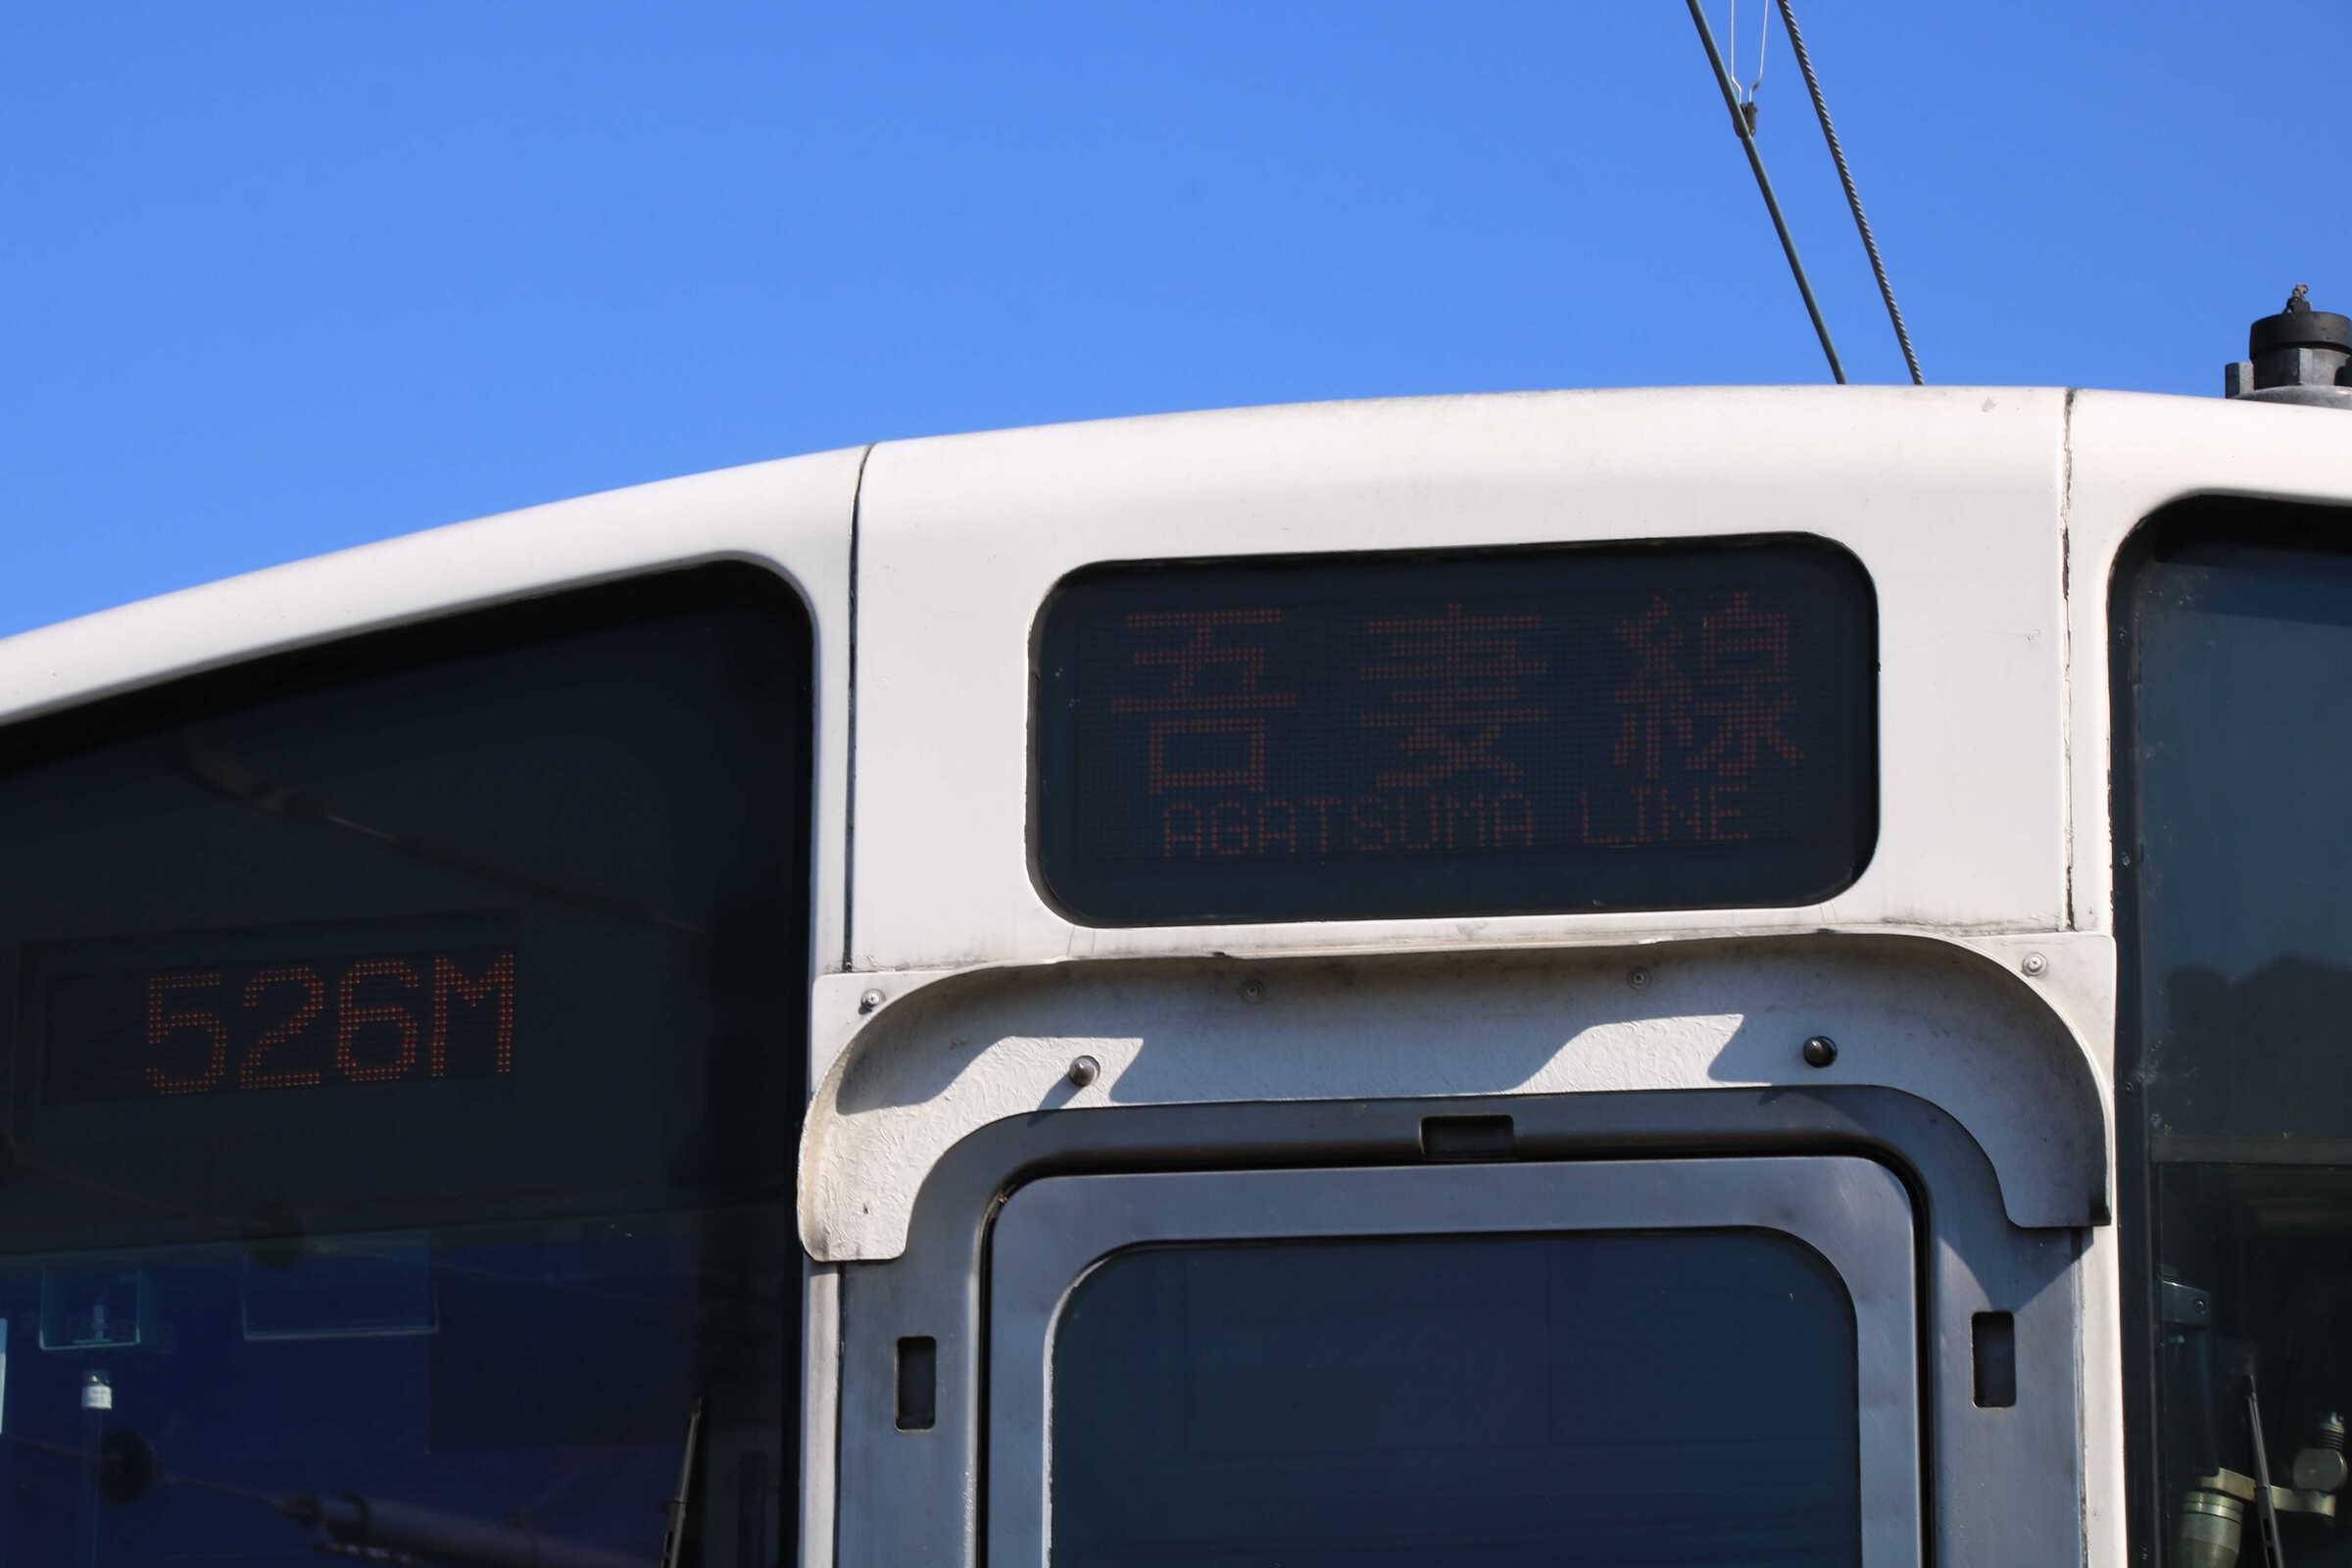 526M 吾妻線 211系 長ナノN327編成